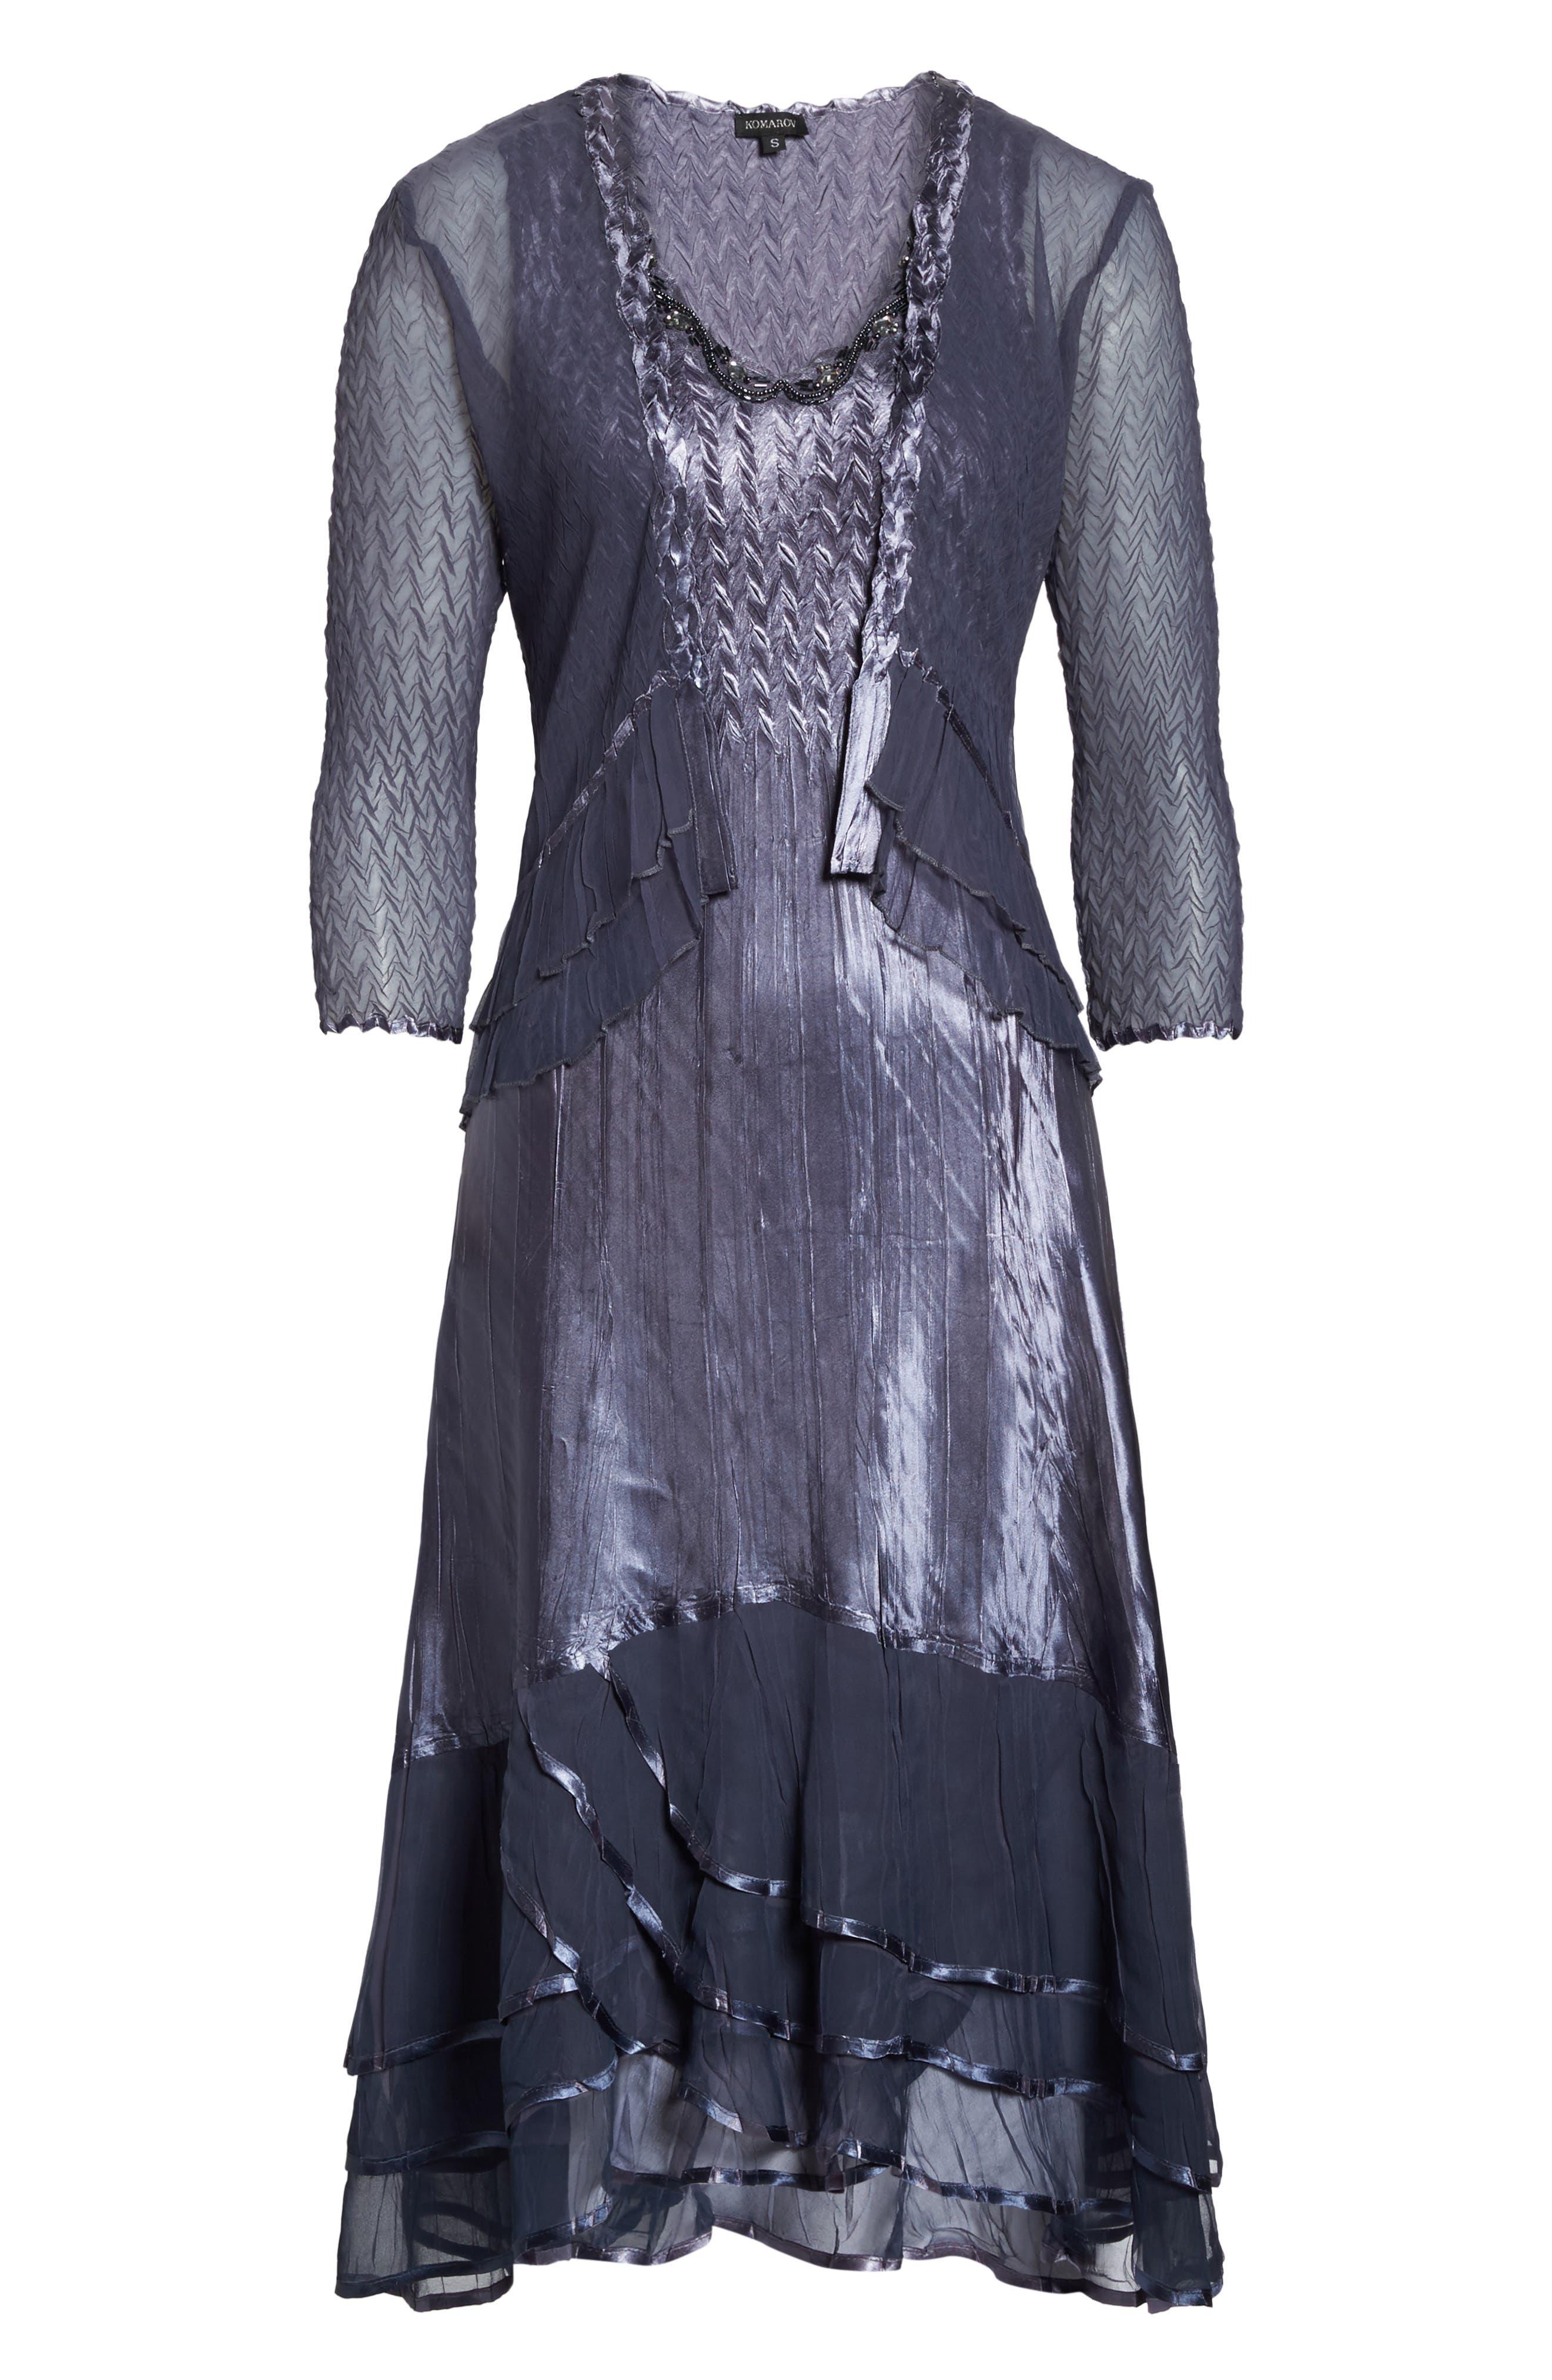 KOMAROV, Embellished Charmeuse Dress & Chiffon Jacket, Alternate thumbnail 7, color, 454